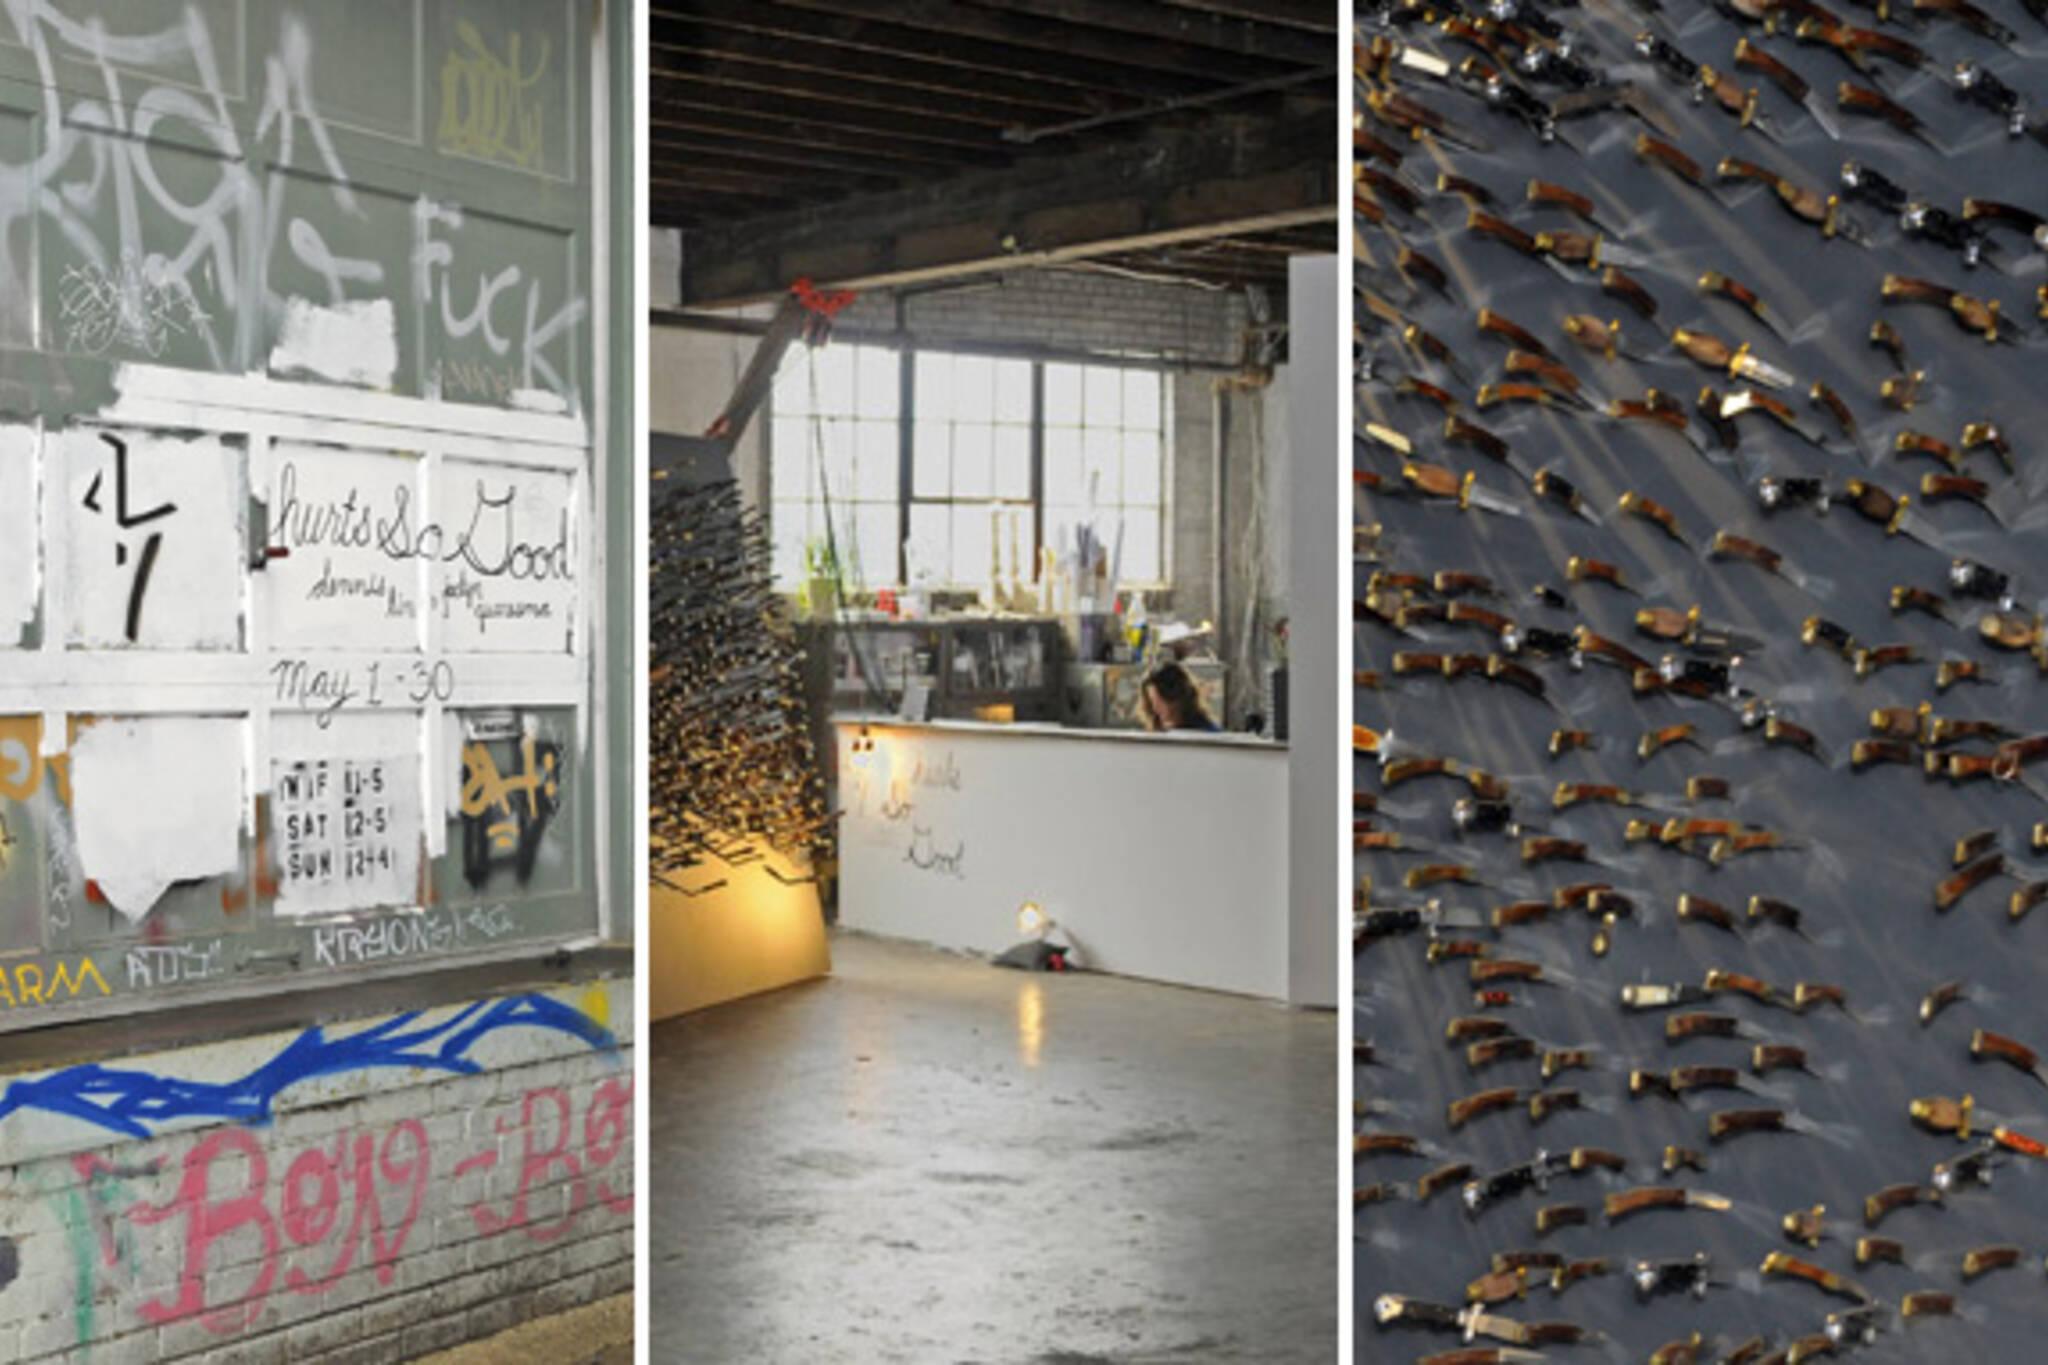 47 gallery toronto